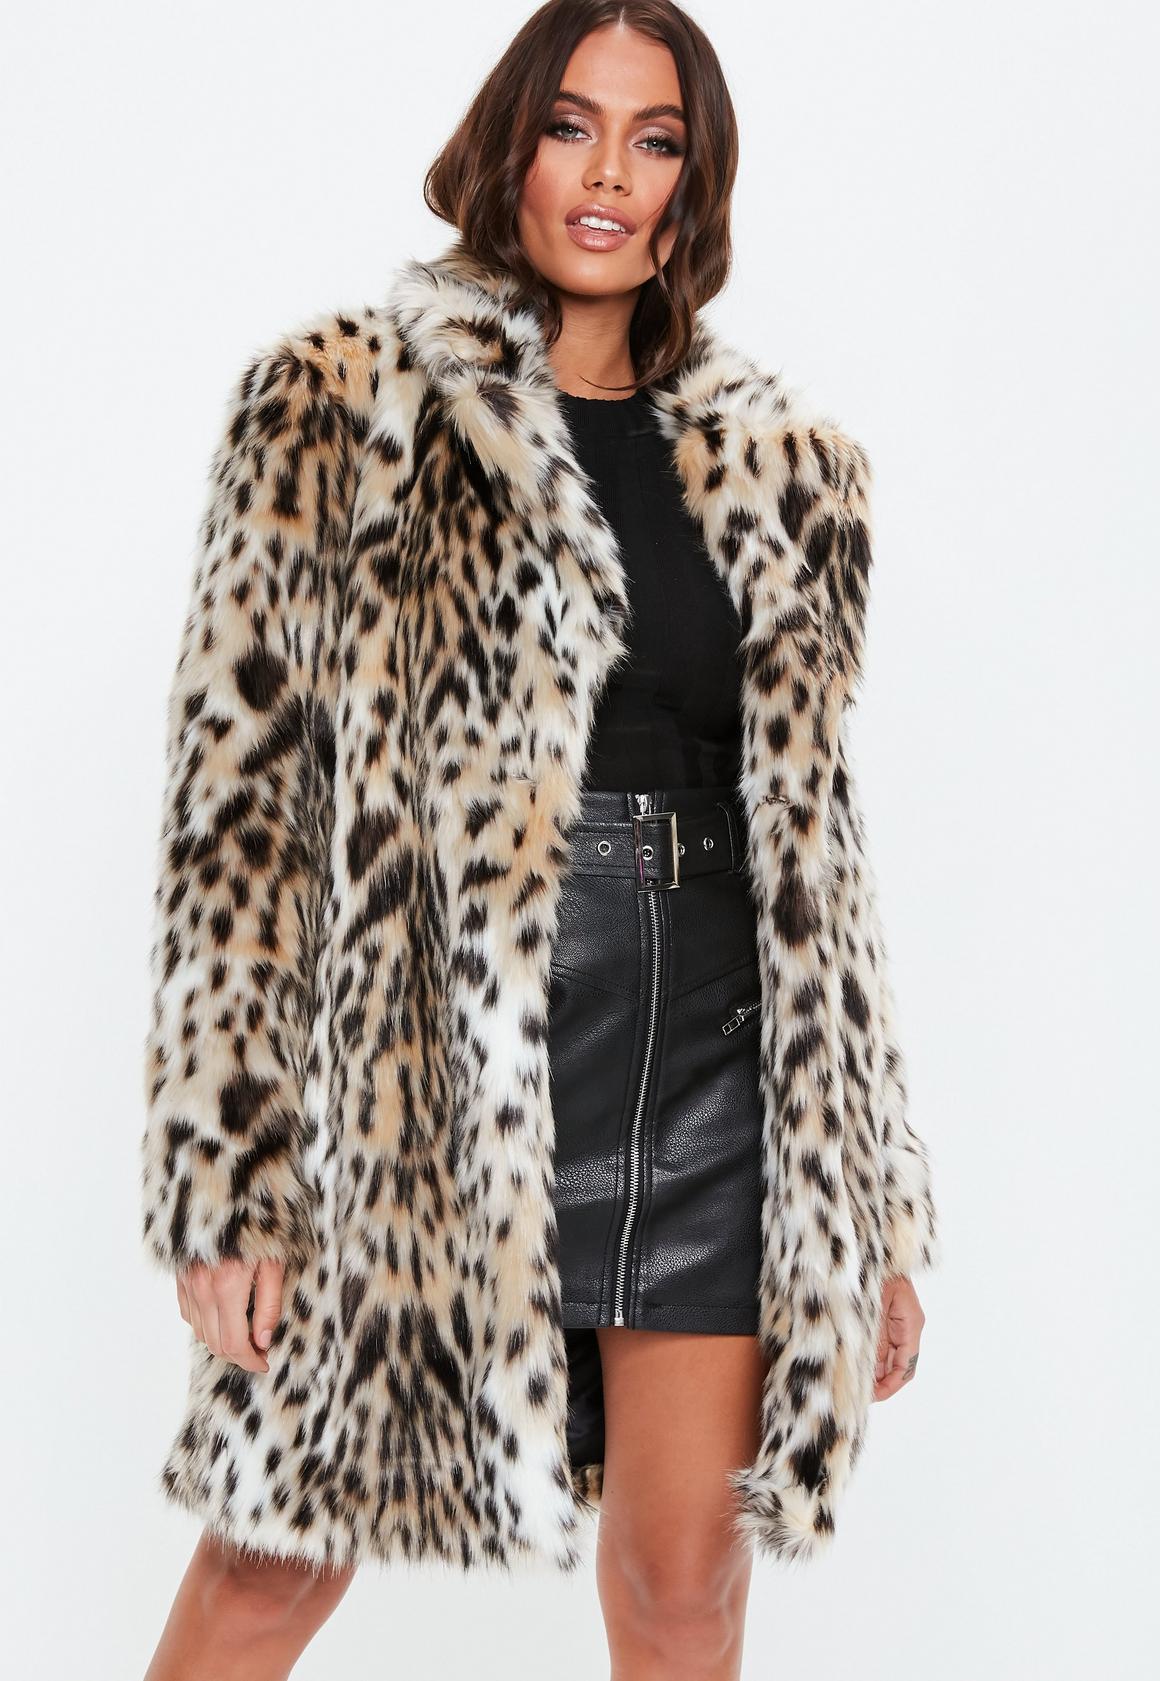 nude-leopard-print-faux-fur-coat.jpg